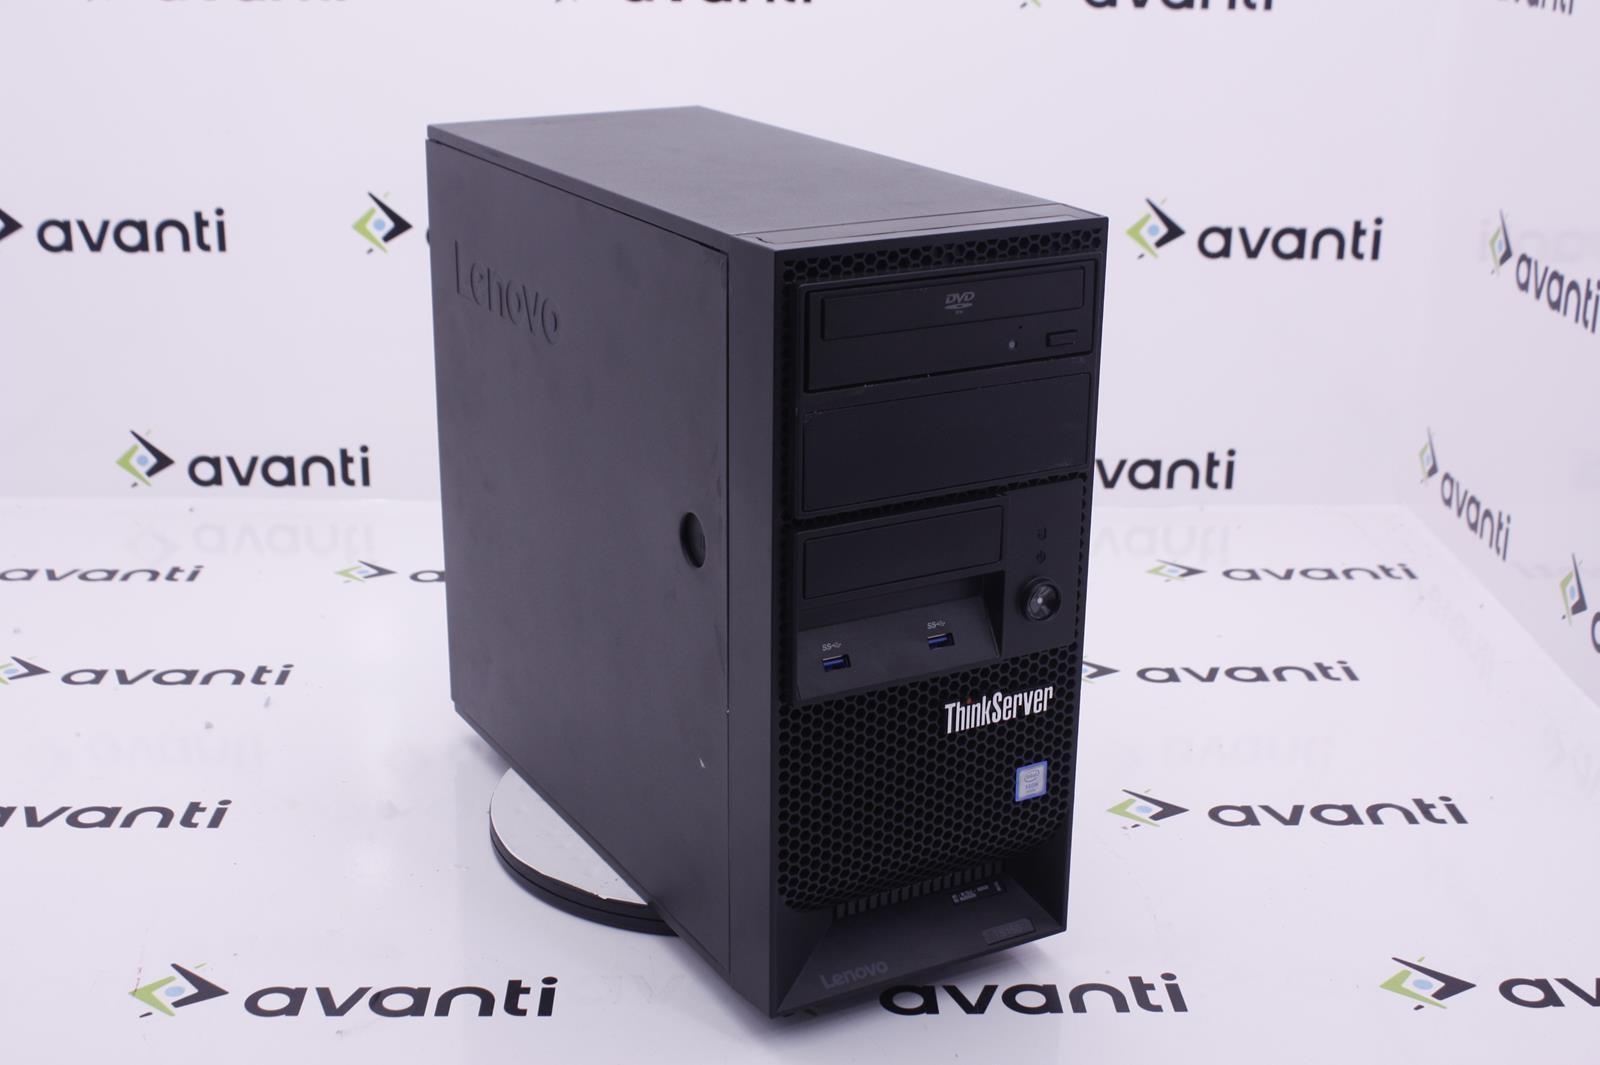 29377-TS150-E31275-8GB-NOHDD_33769_base